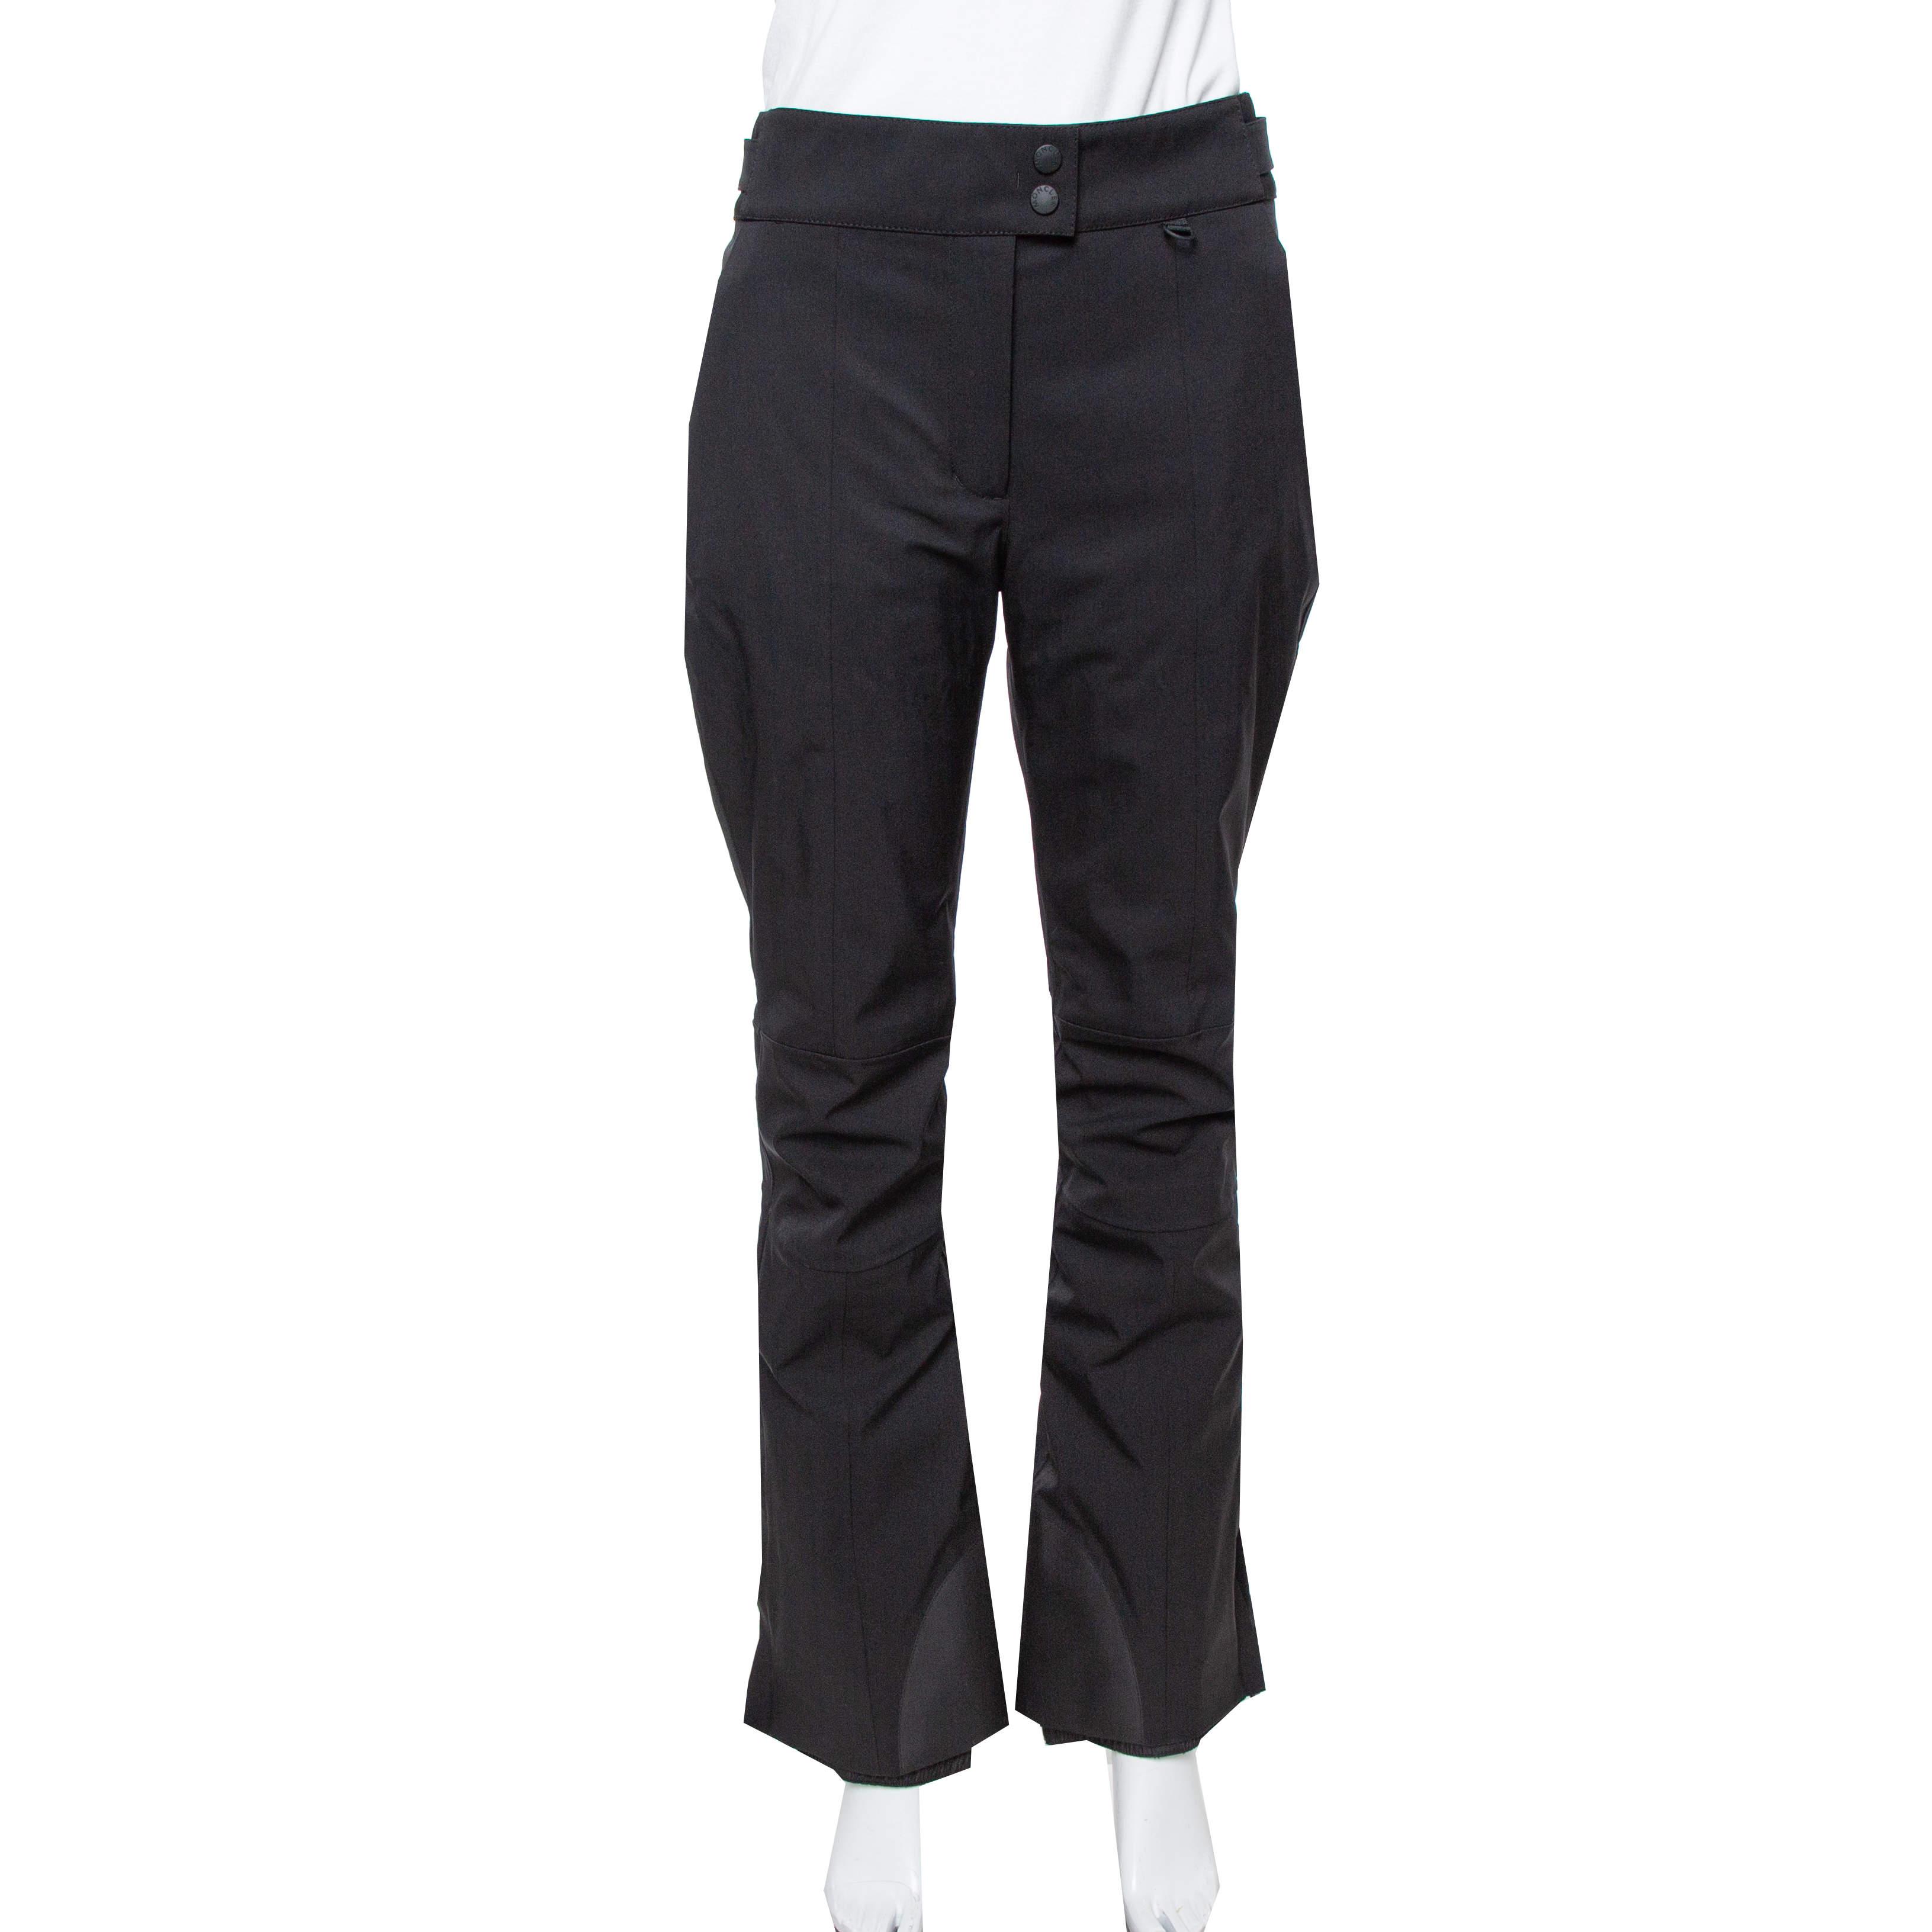 Moncler Black Padded Sportivo Ski Pants M